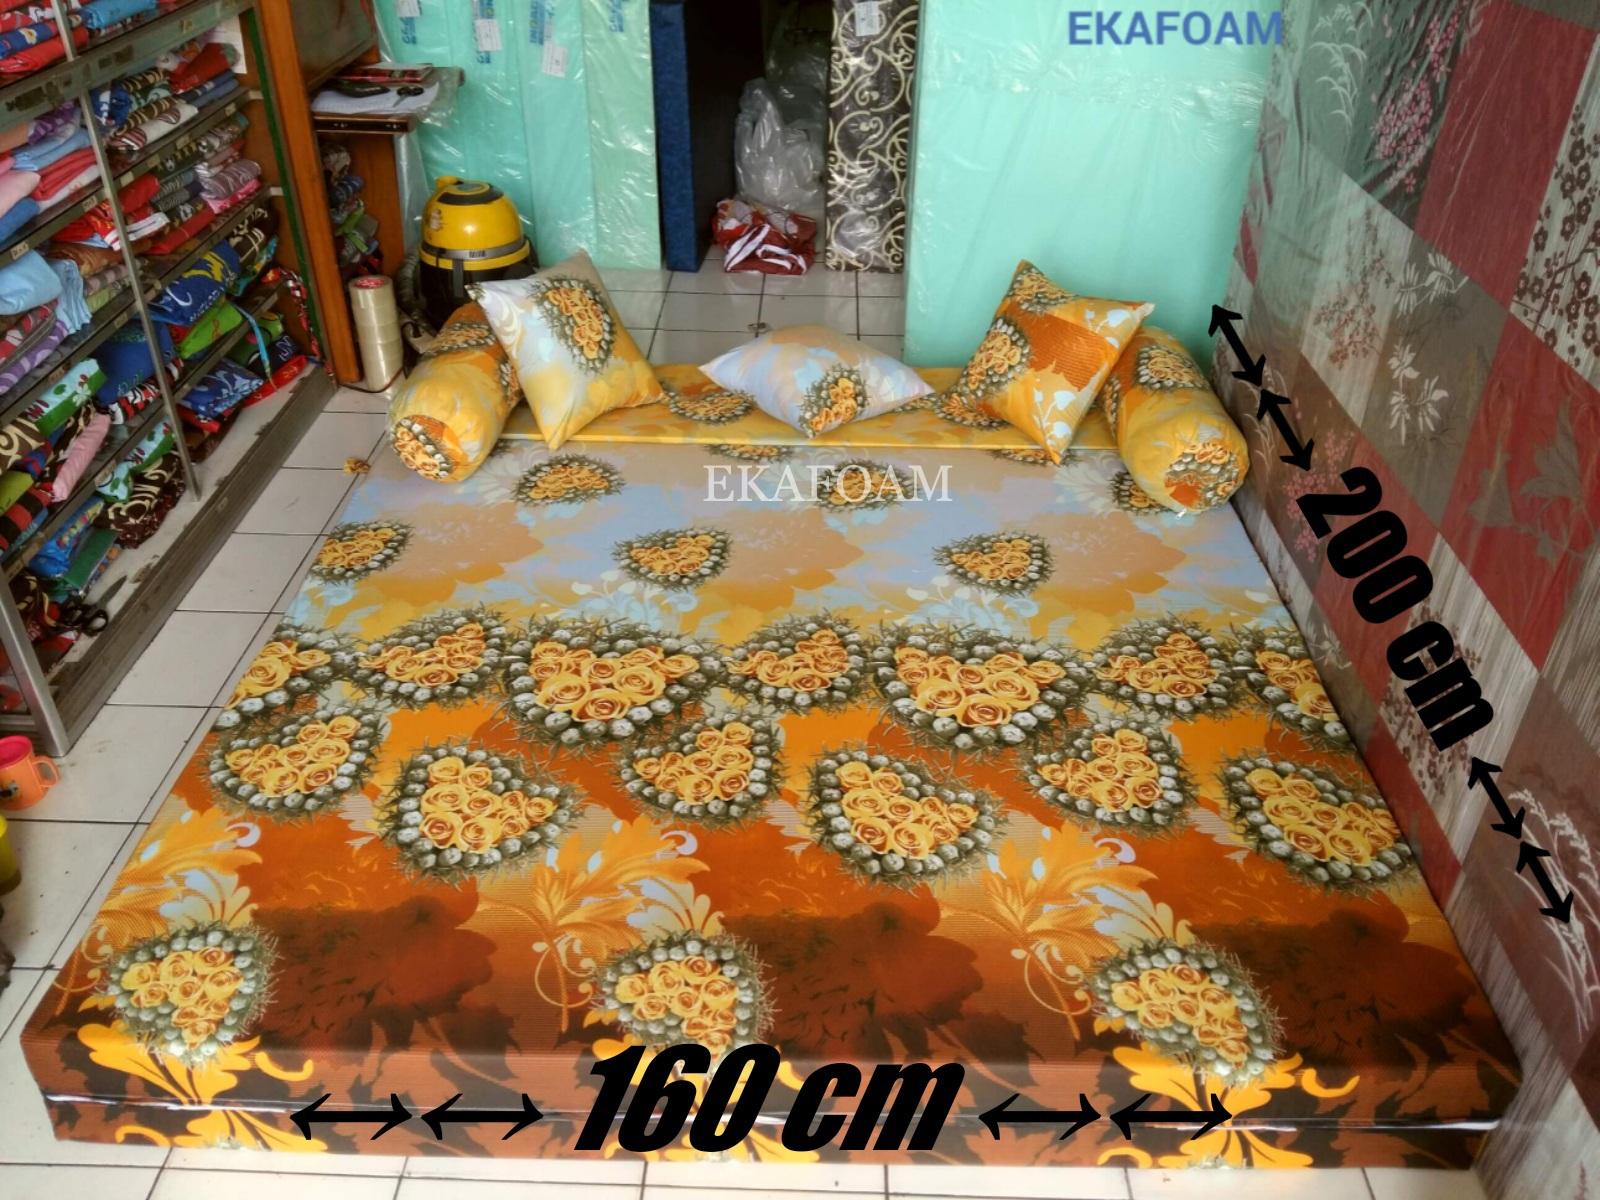 Harga Sofa Bed Inoac No 1 Squashy Sofas Uk Kasur Dan Lipat Terbaru